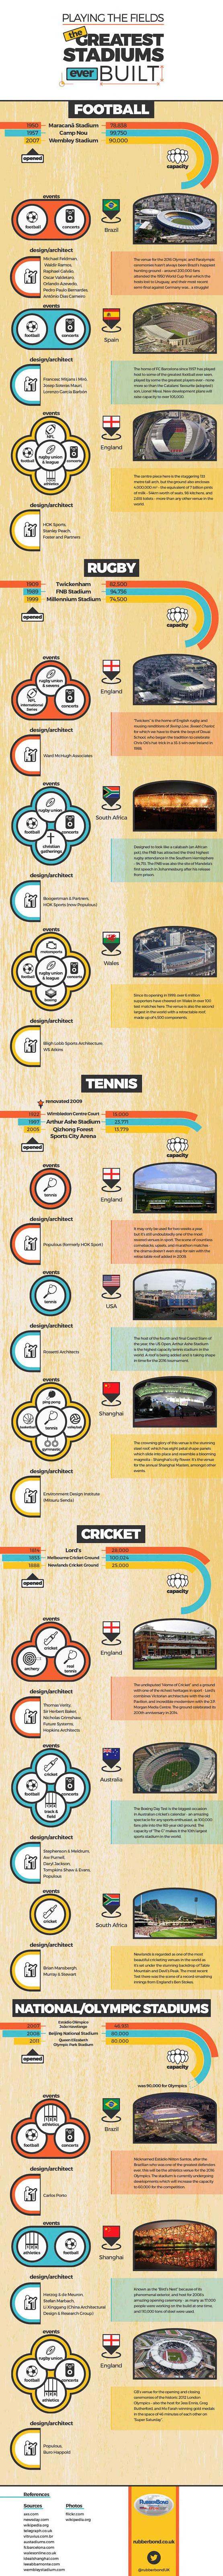 Greatest-Stadiums-Ever-Built